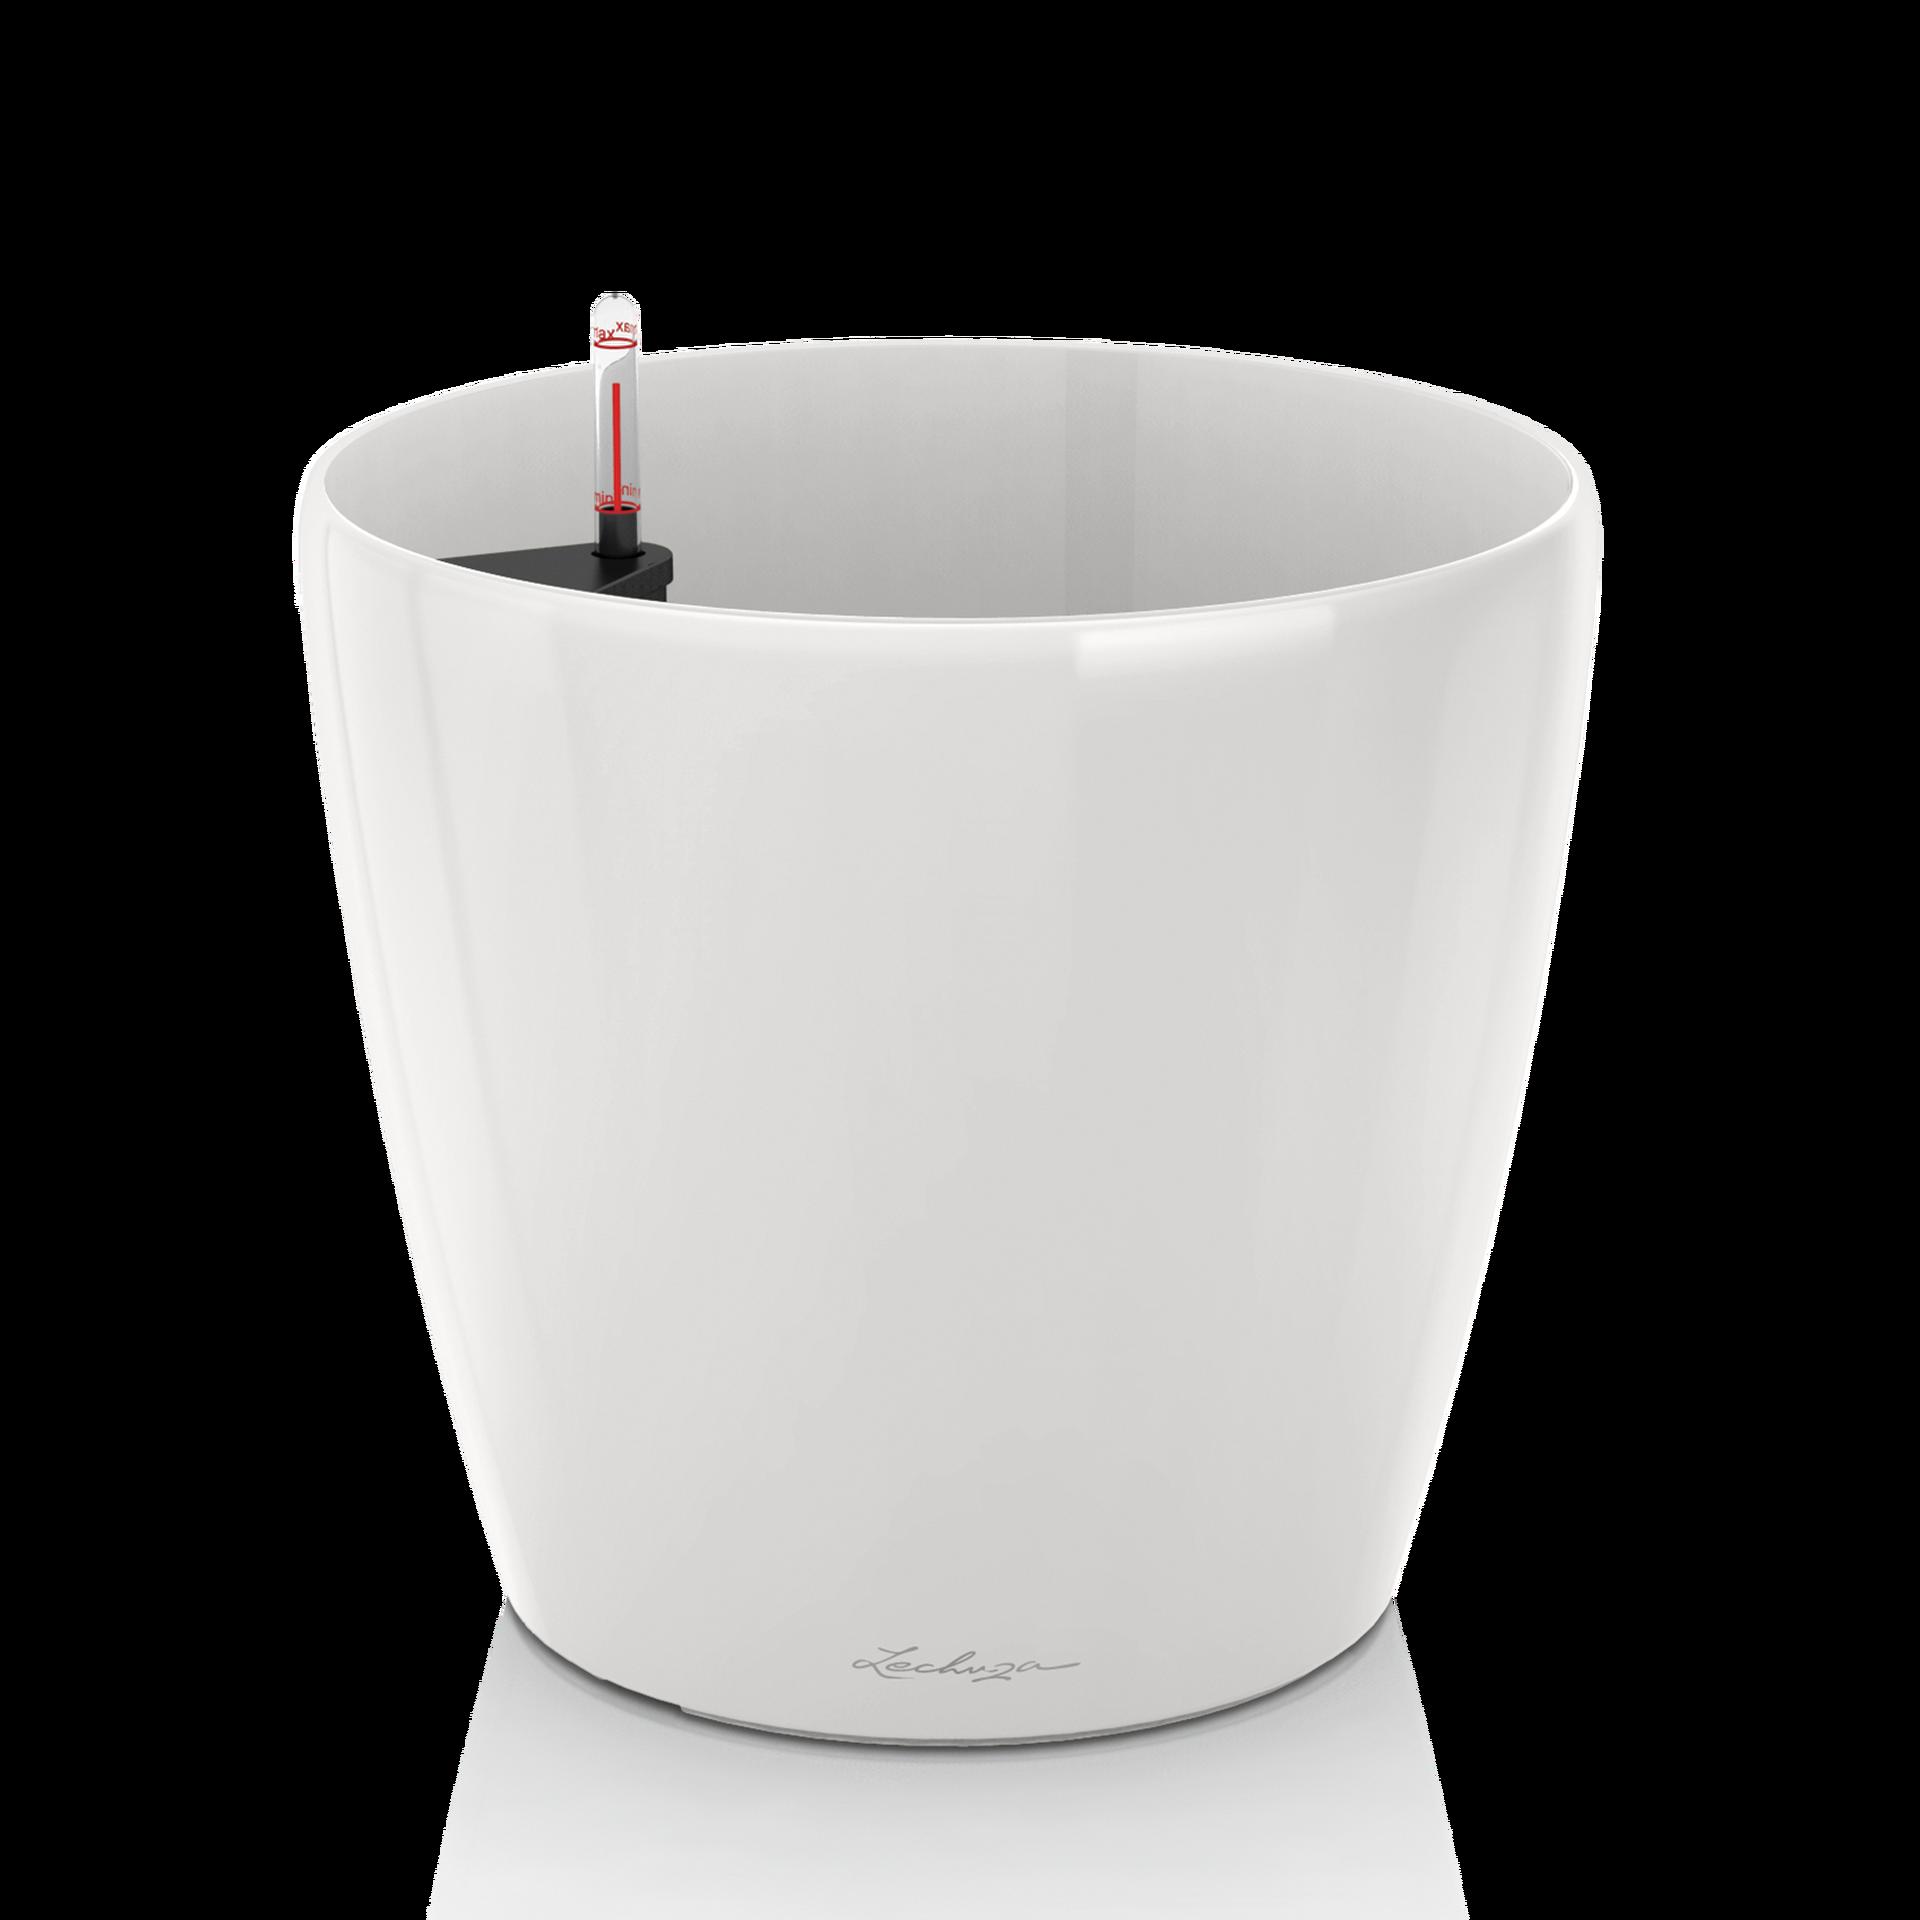 CLASSICO 60 blanc brillant